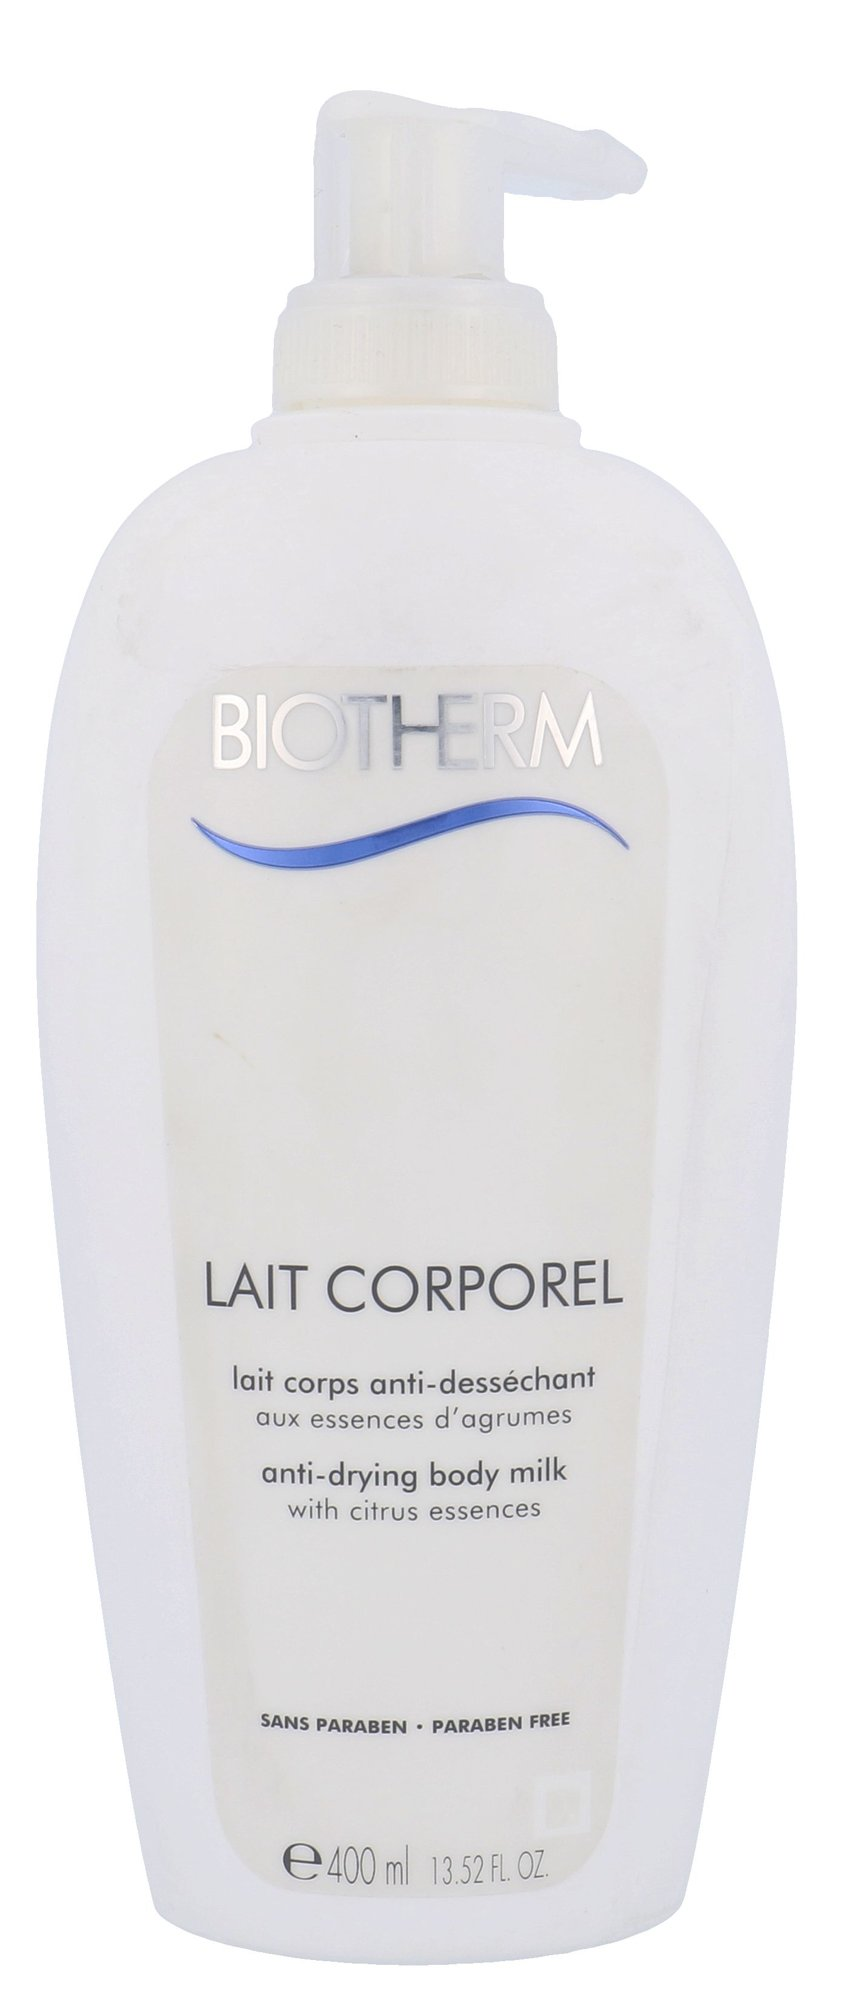 Biotherm Lait Corporel Cosmetic 400ml